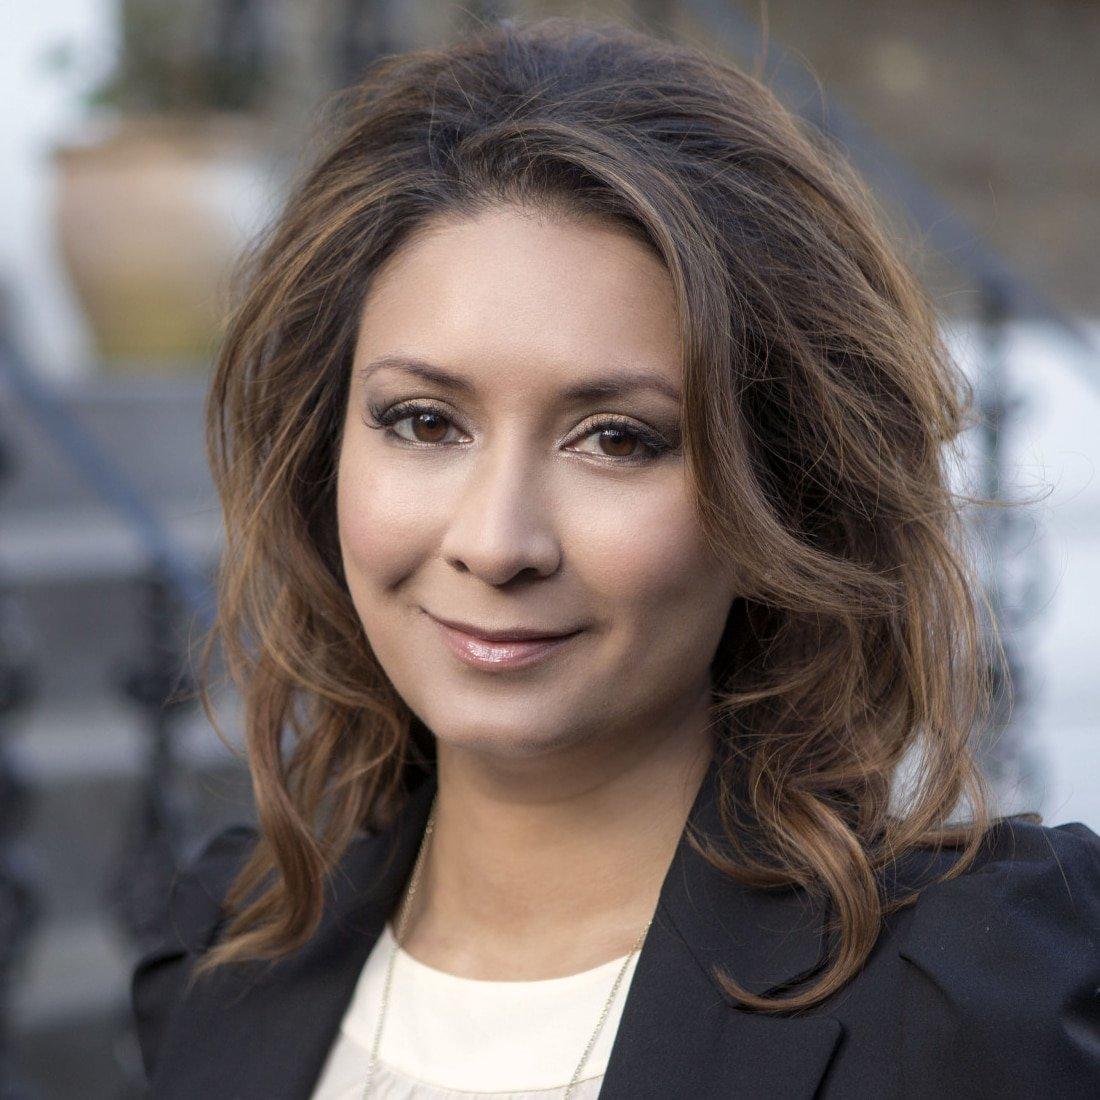 Ayesha Hazarika UK Political Commentator stand up comedian at Great British Speakers